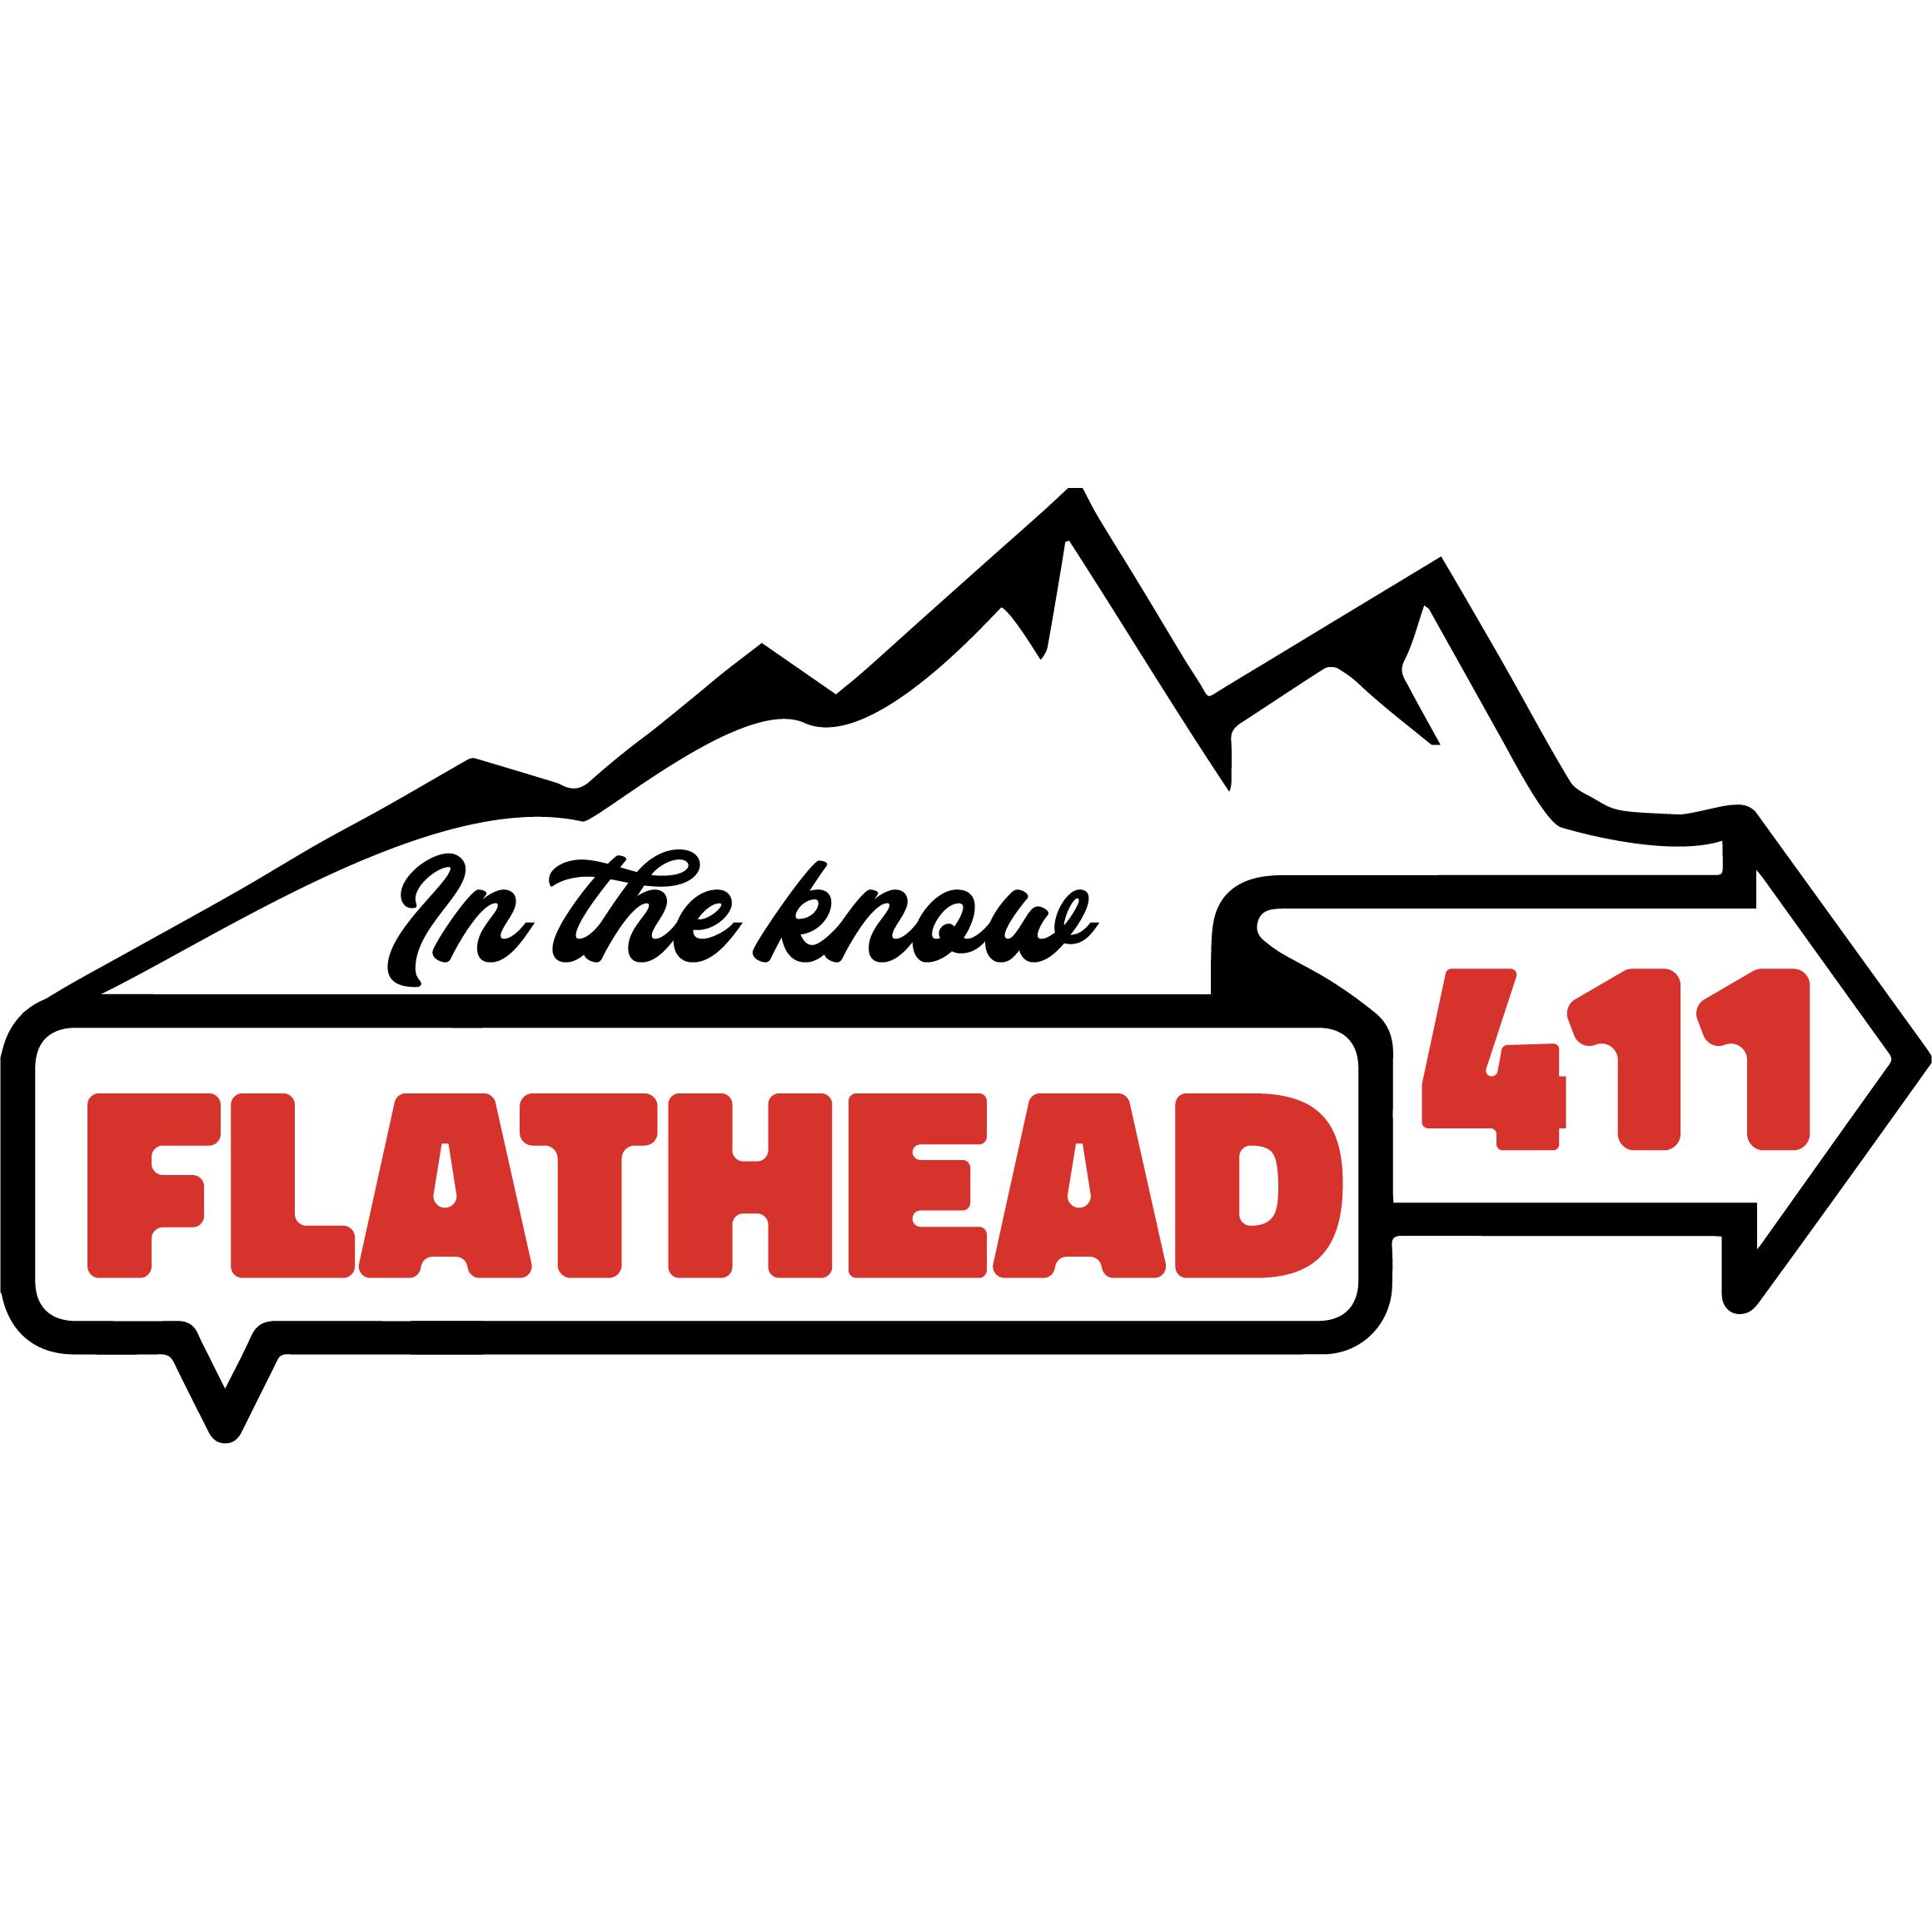 Flathead 411